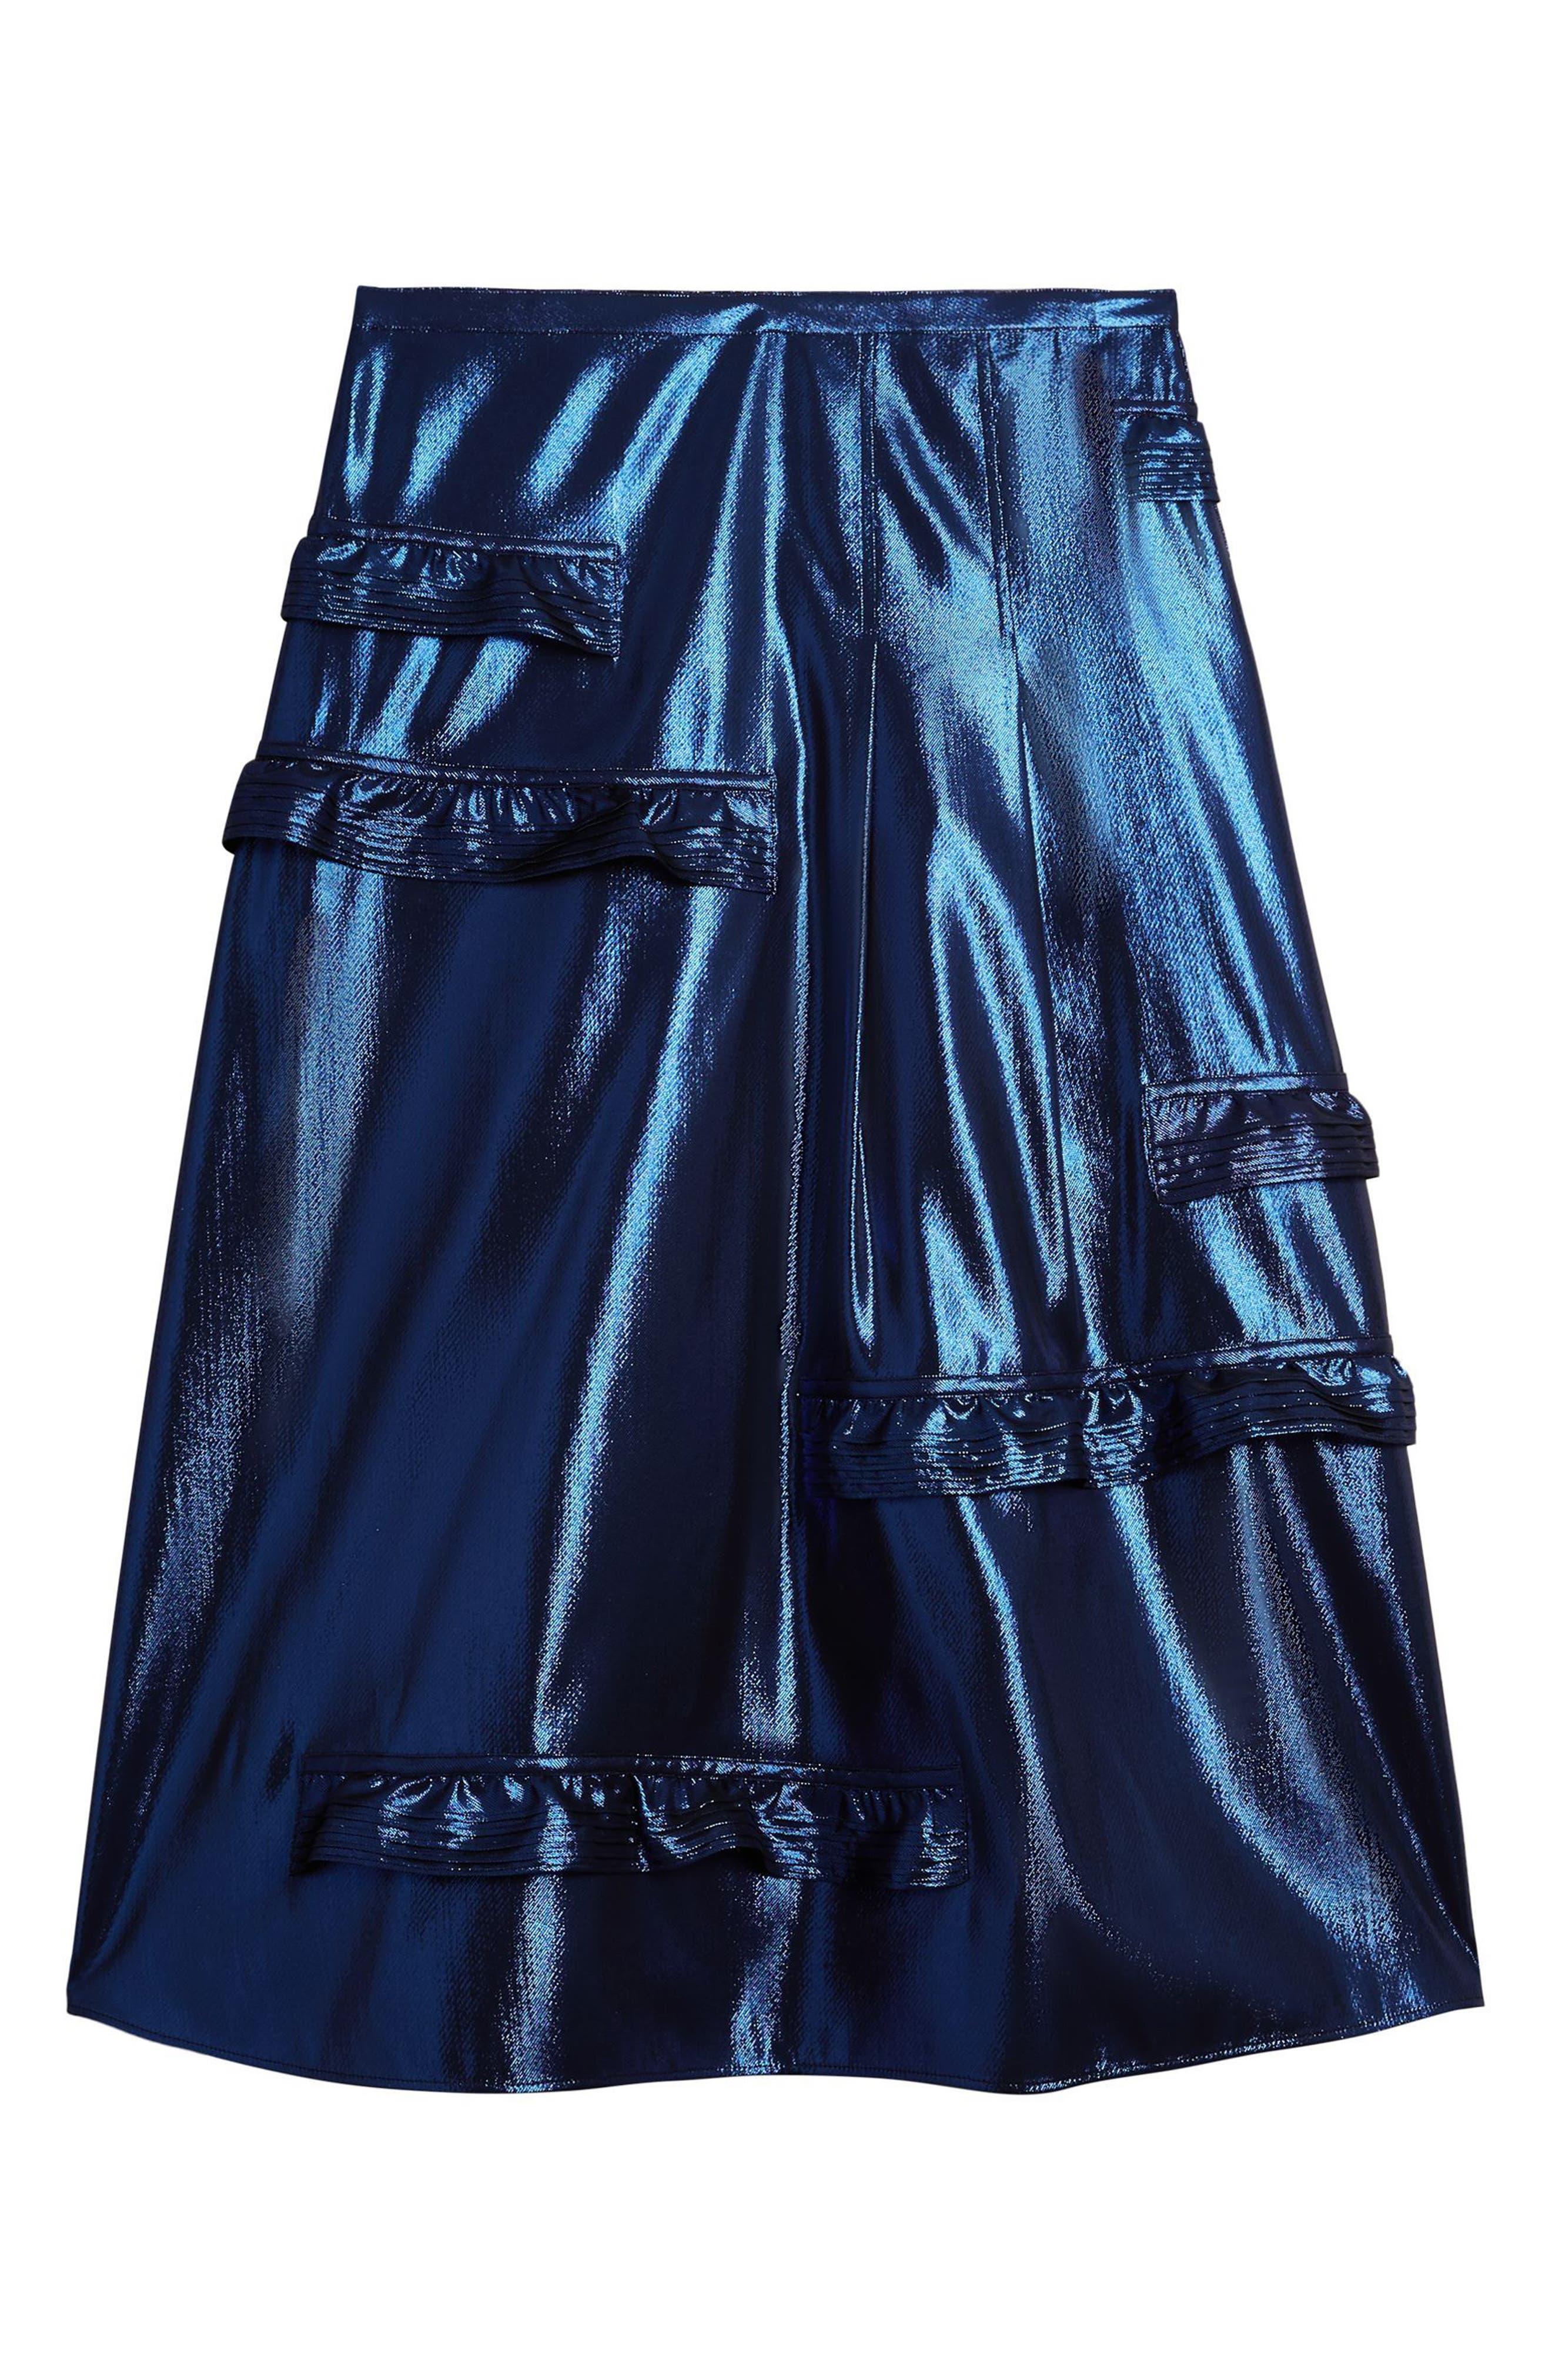 Merse Metallic Ruffle Skirt,                             Alternate thumbnail 4, color,                             410